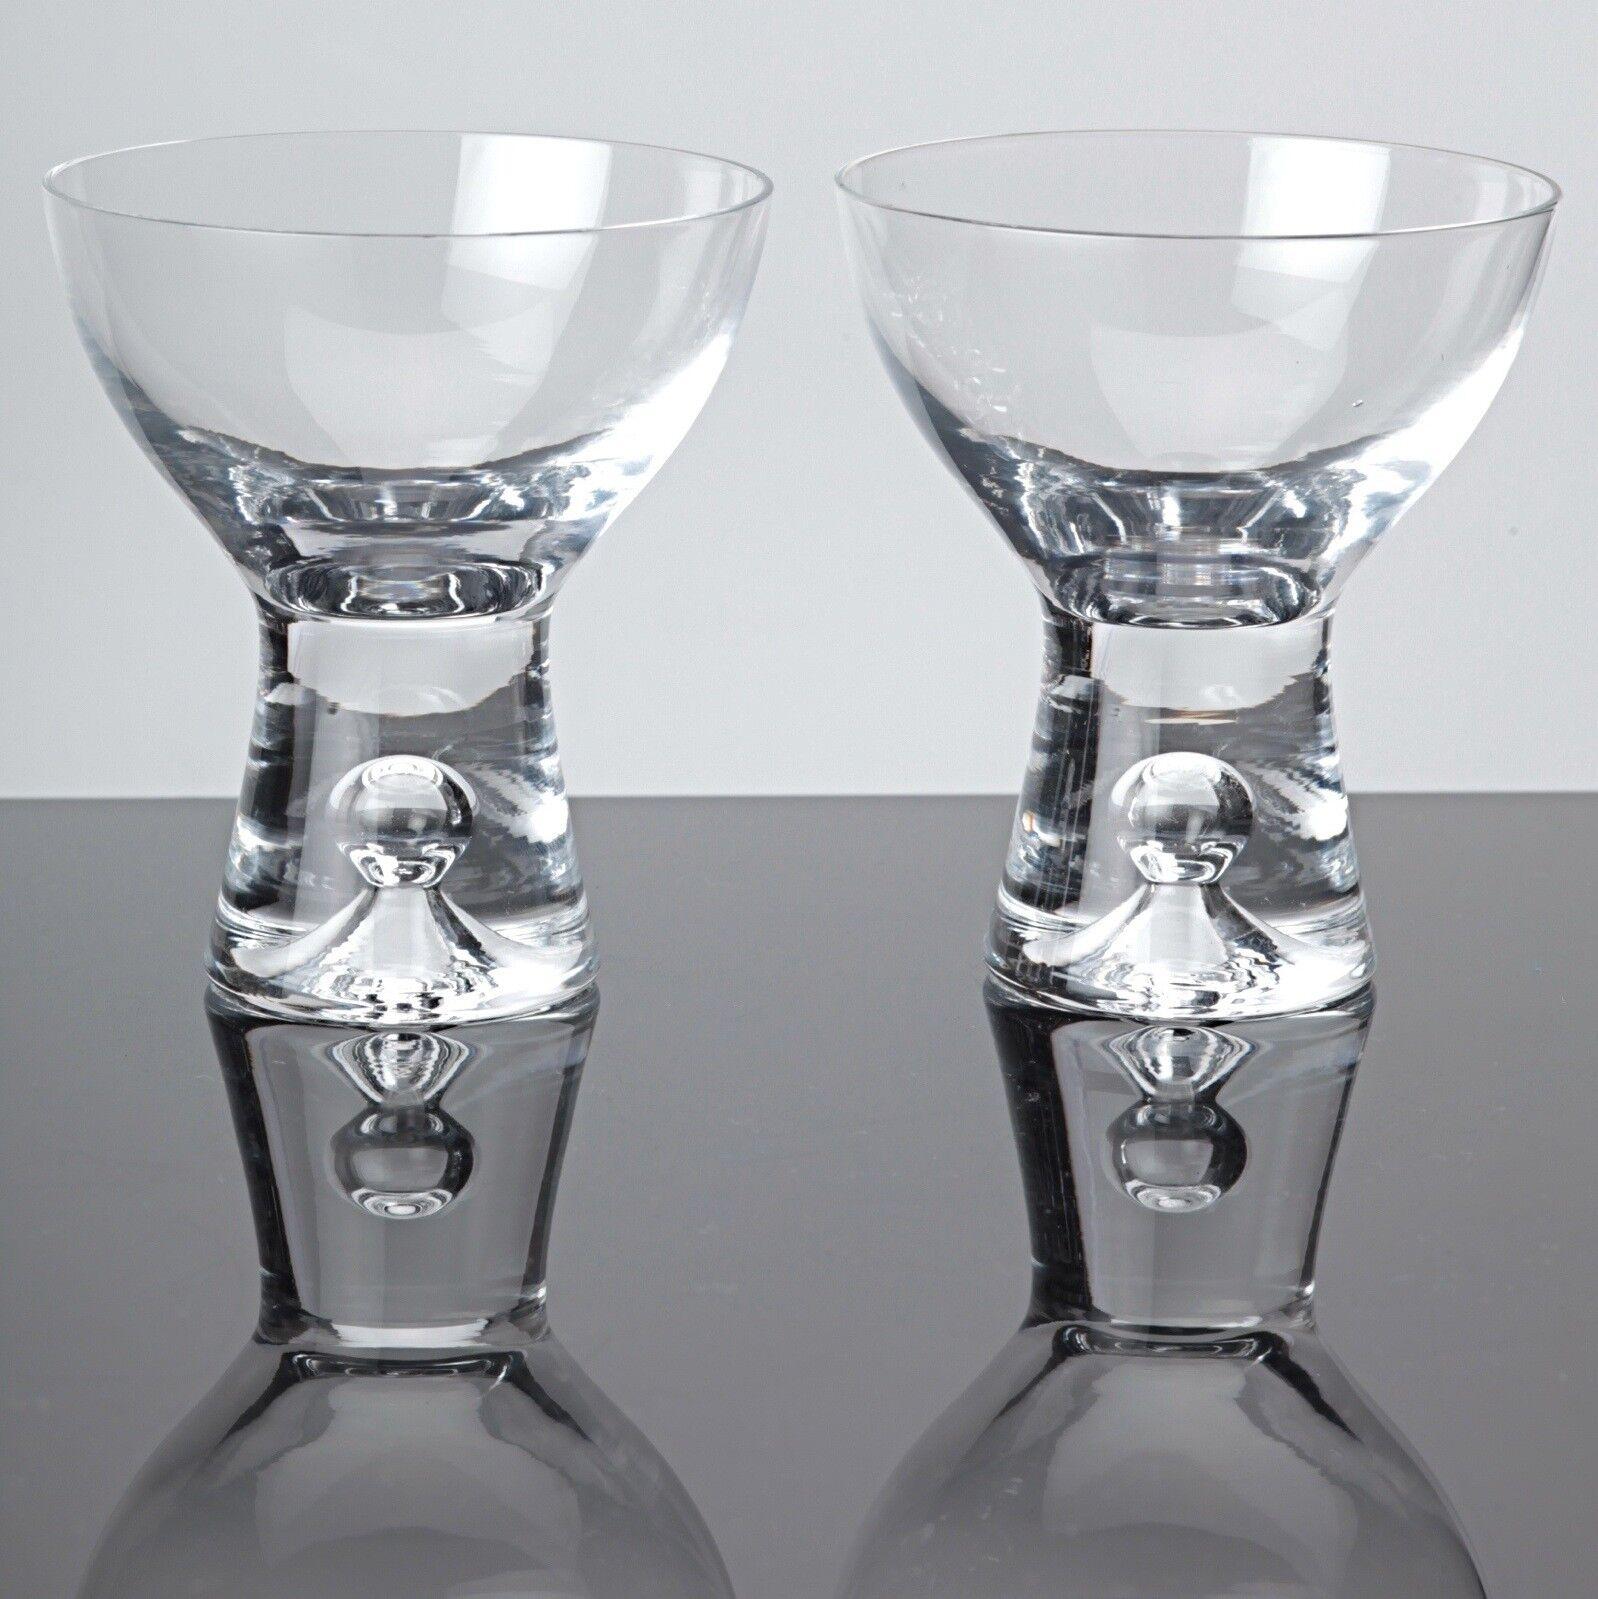 2 Gläser iittala Tapio Wirkkala 50er Likörschalen Likörgläser Vintage 8,2 cm | New Products